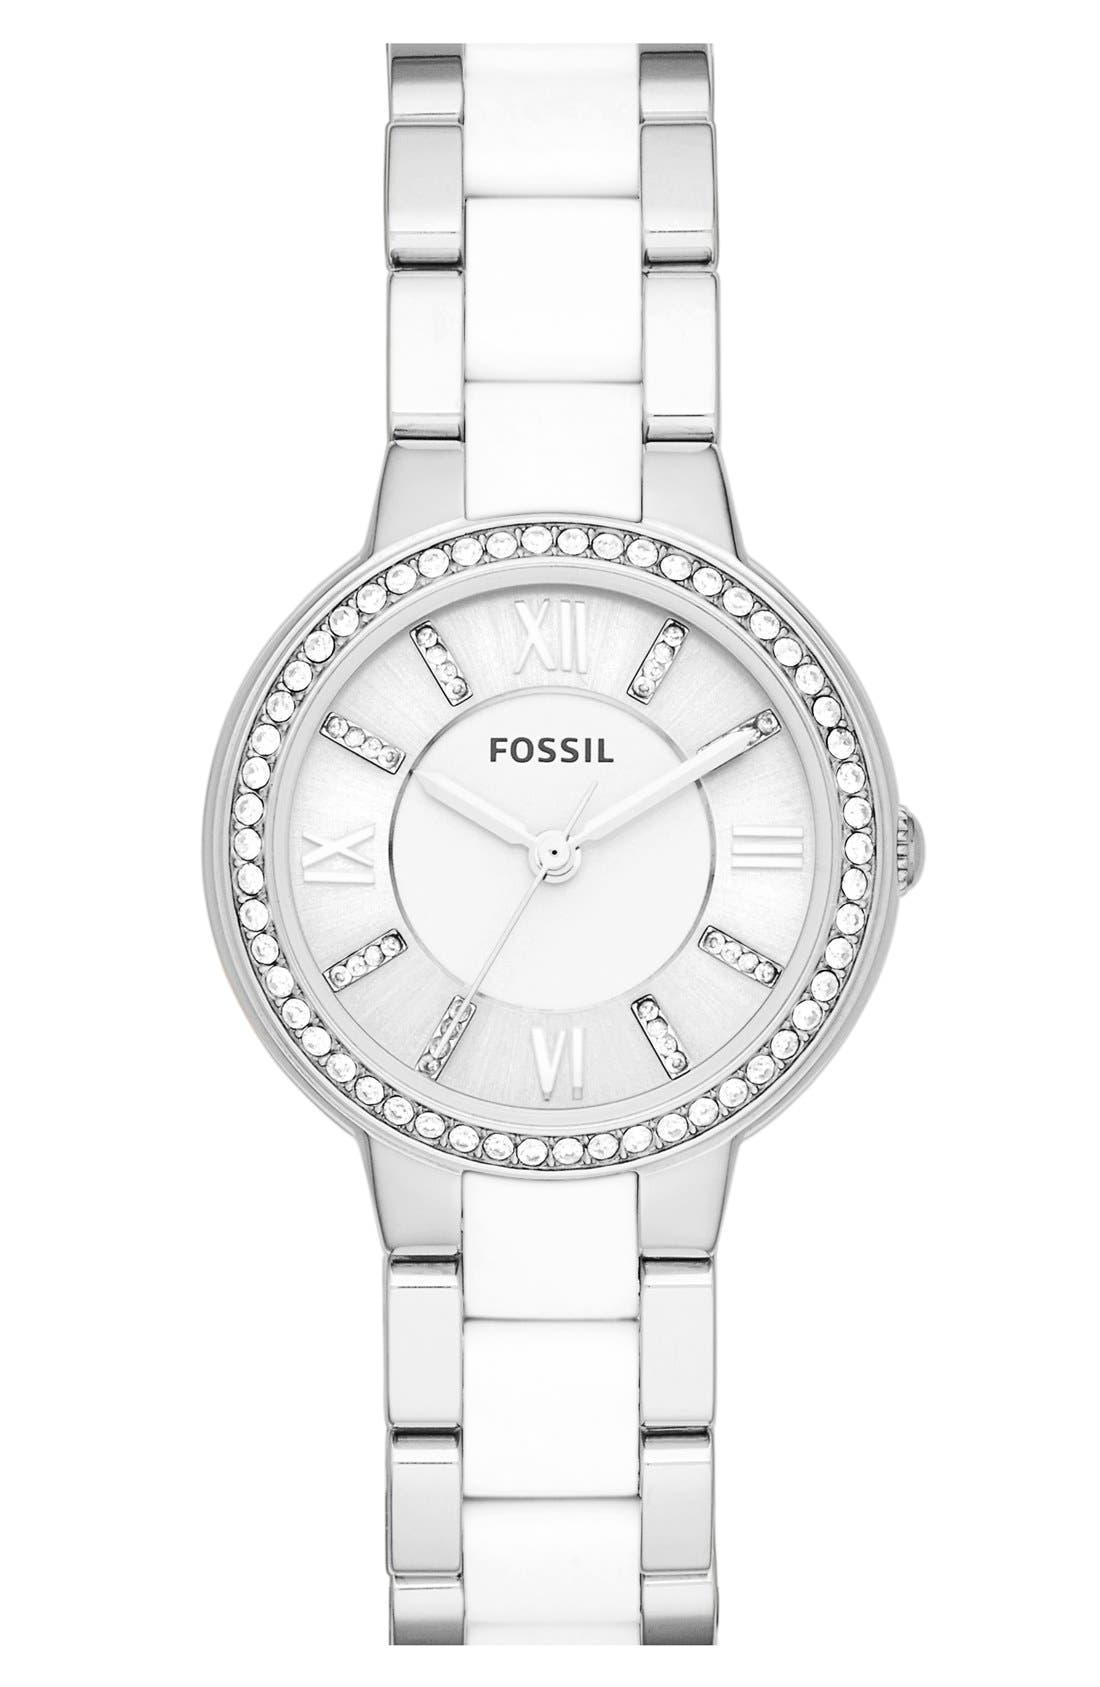 Main Image - Fossil 'Virginia' Crystal Bezel Resin Link Bracelet Watch, 28mm